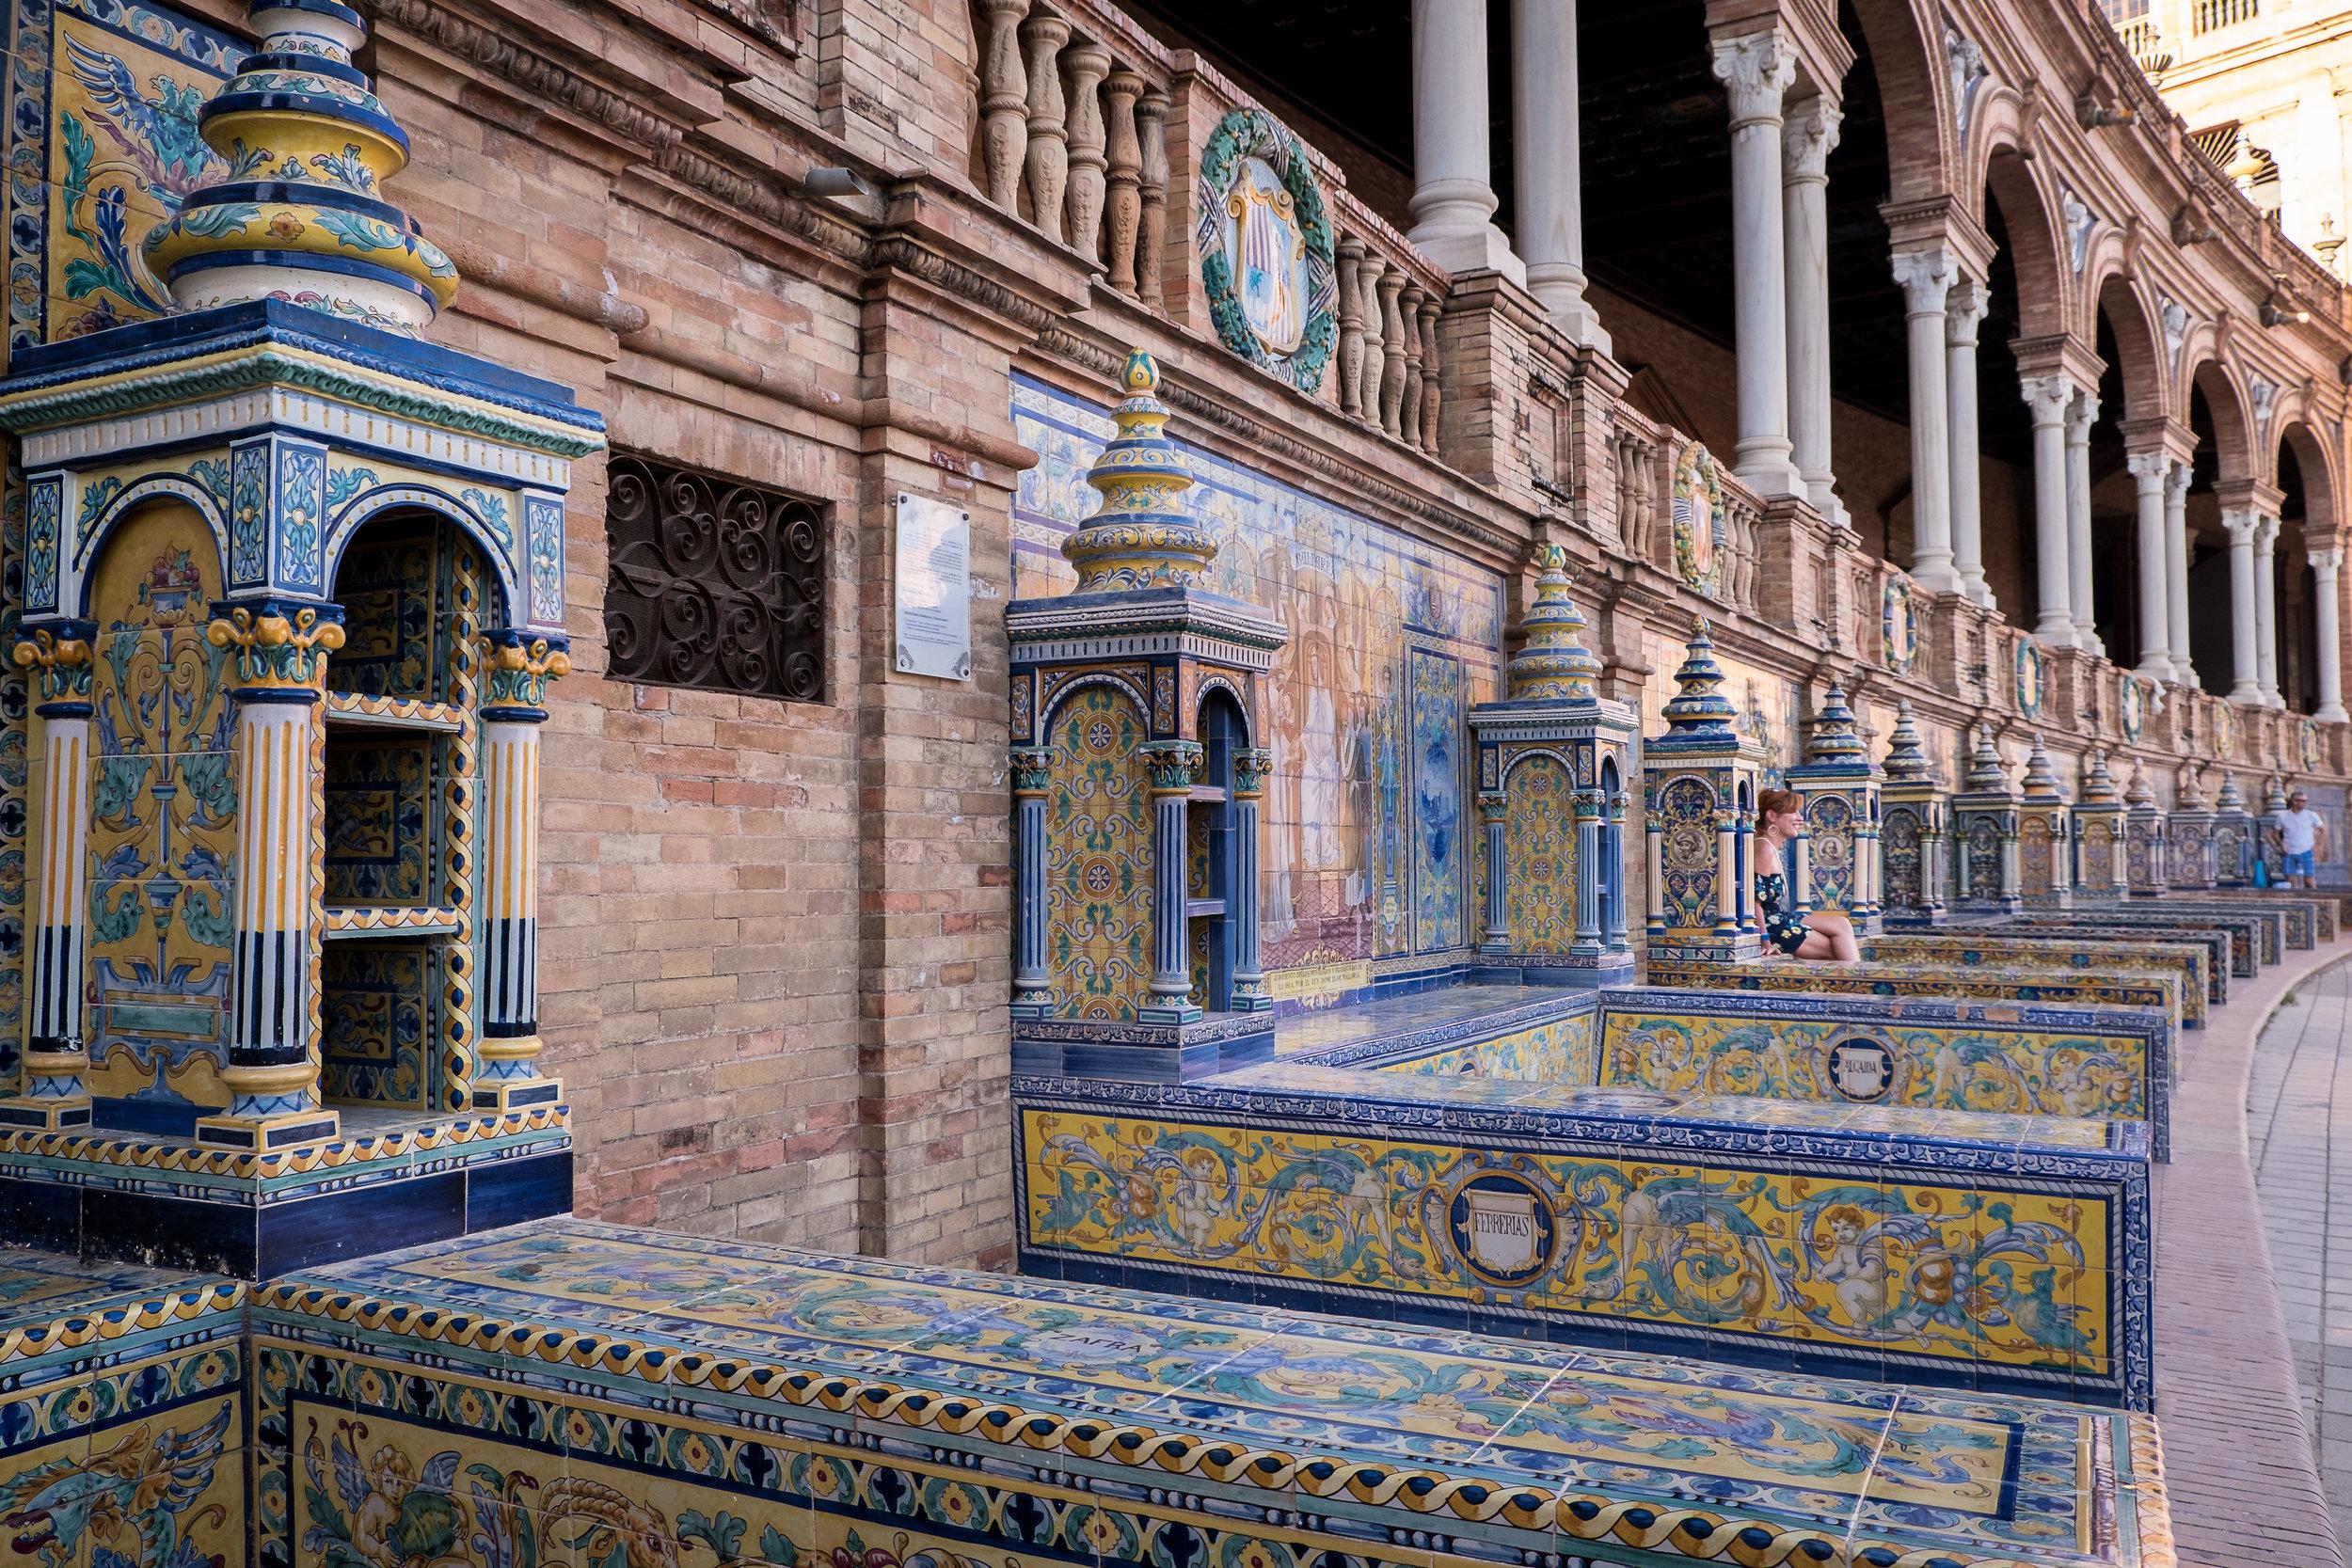 Sevilla_Plaza de Espana-5.jpg